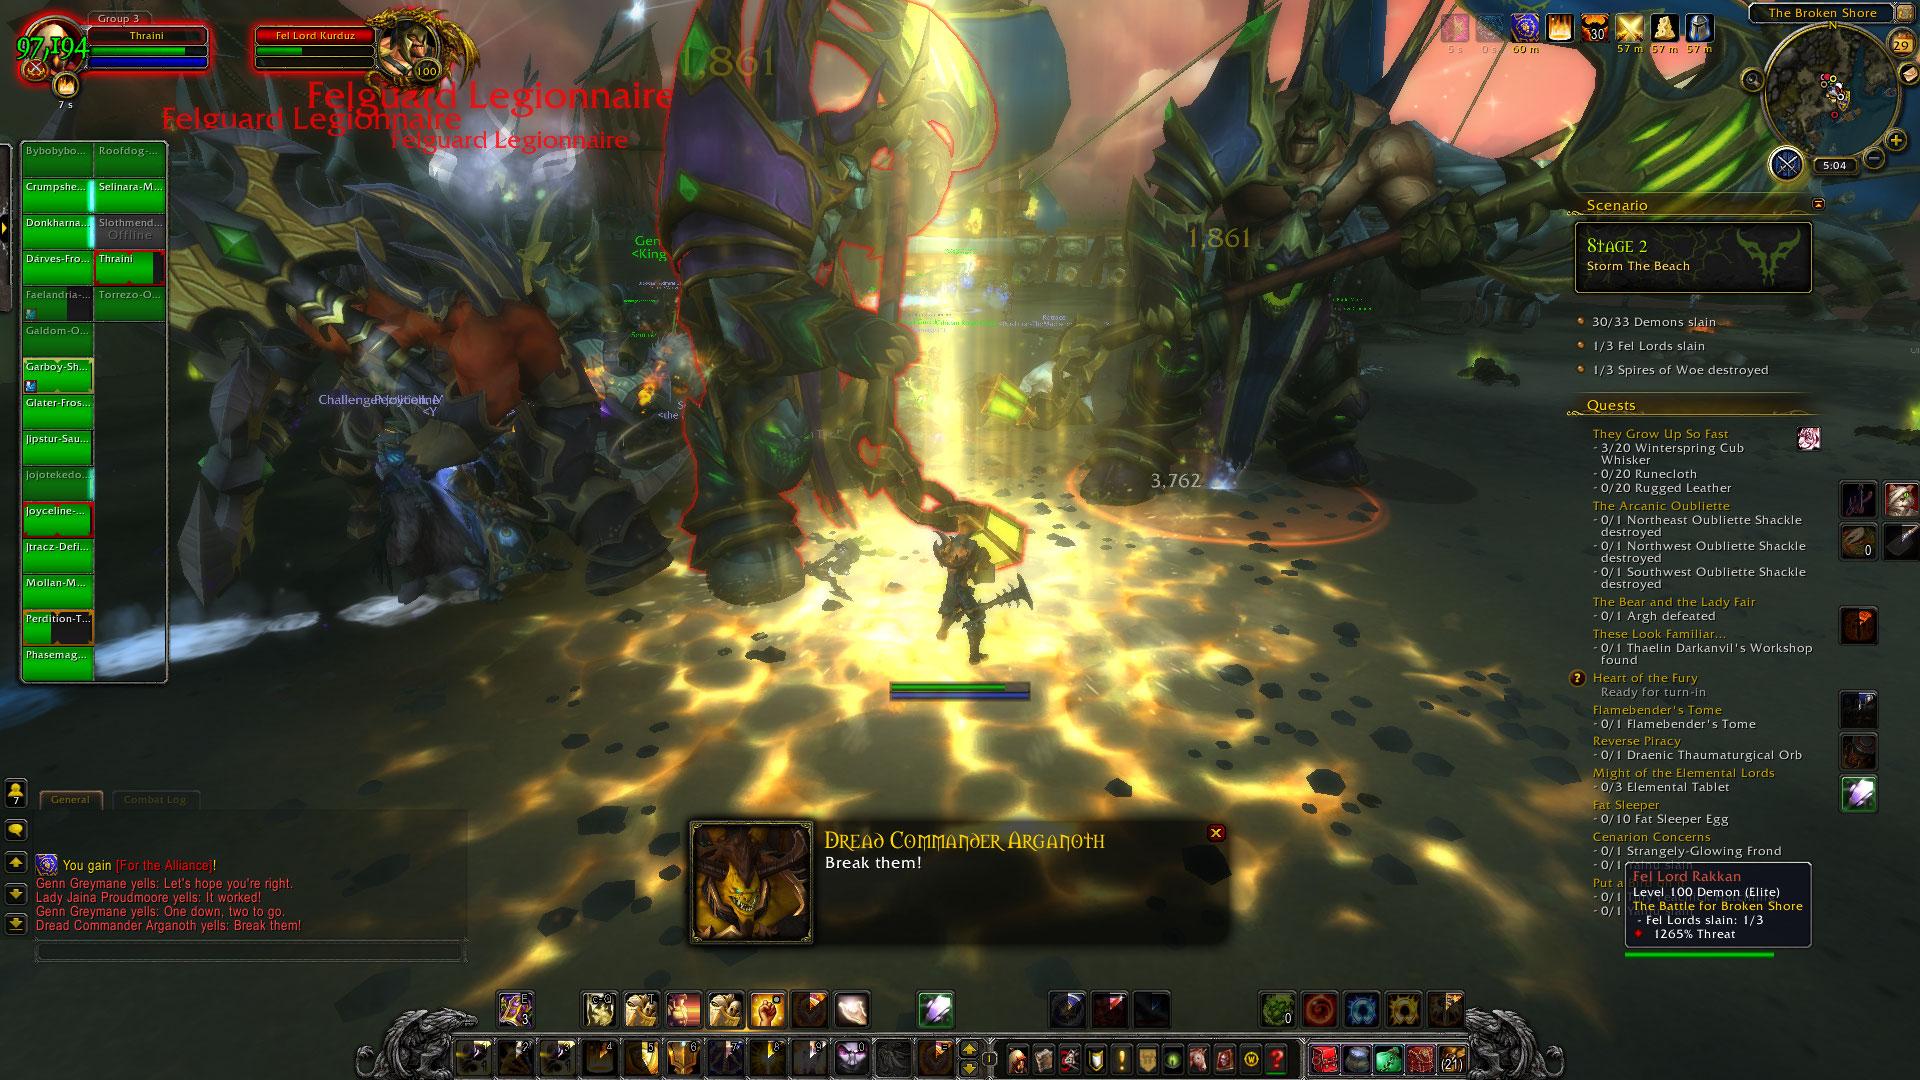 World of Warcraft: Legion fotoseriál - Plamenná legie přichází 129829